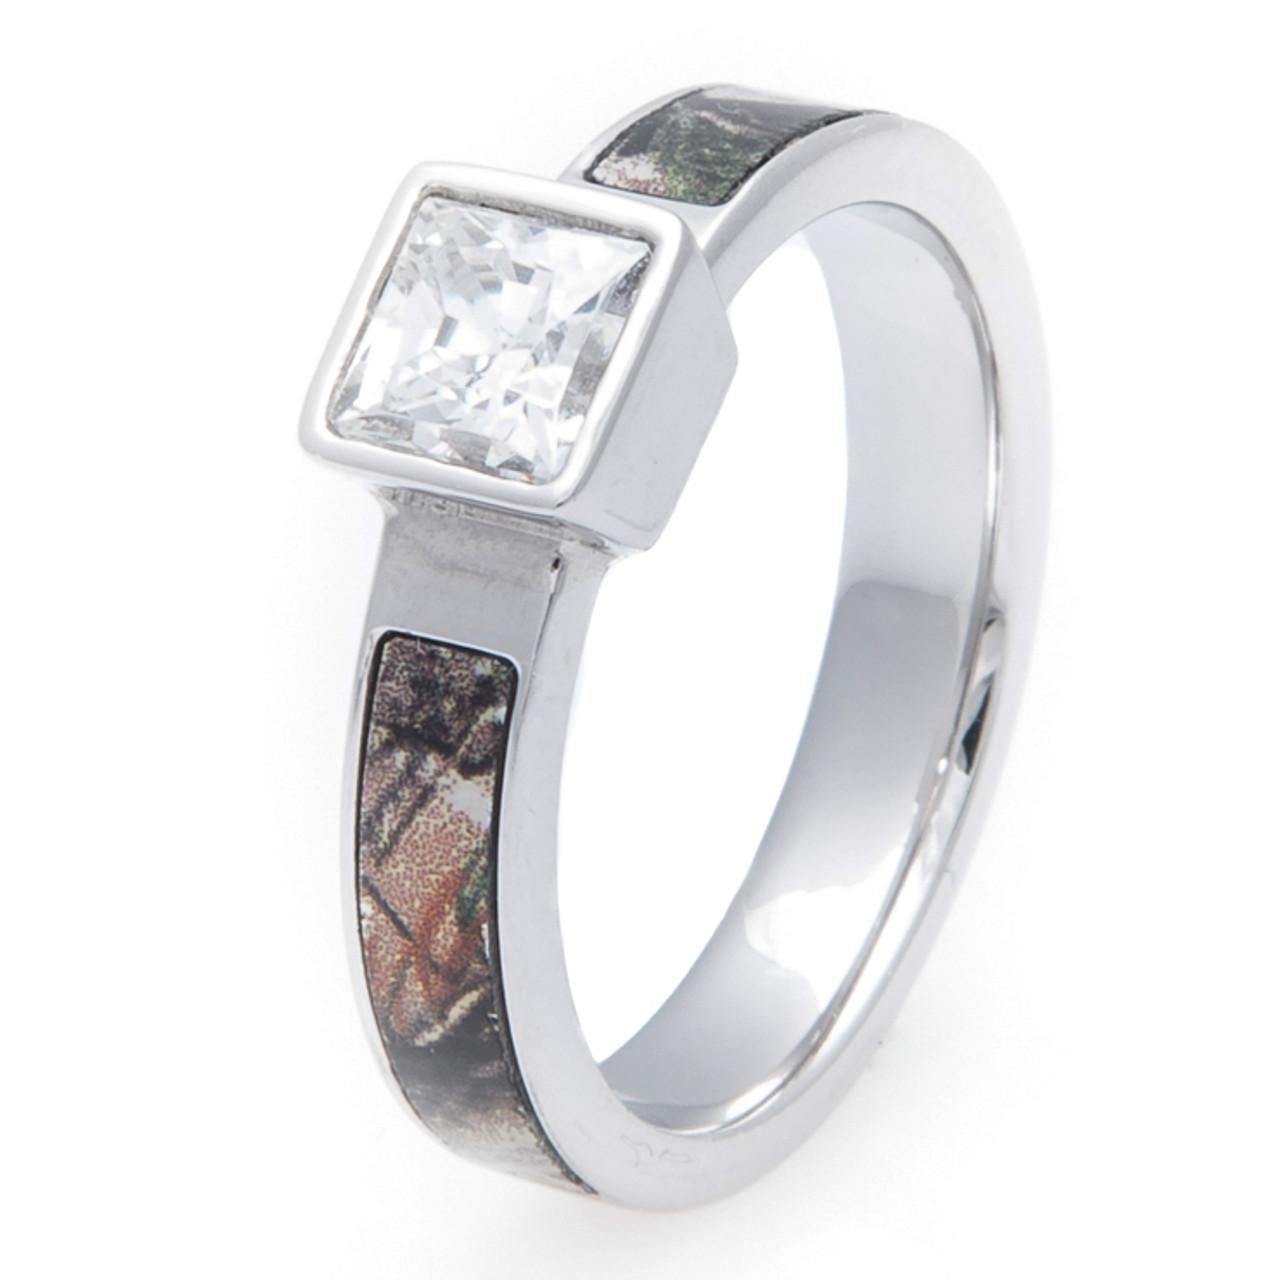 Cobalt Chrome Square Diamond Camo Ring Titanium Buzz